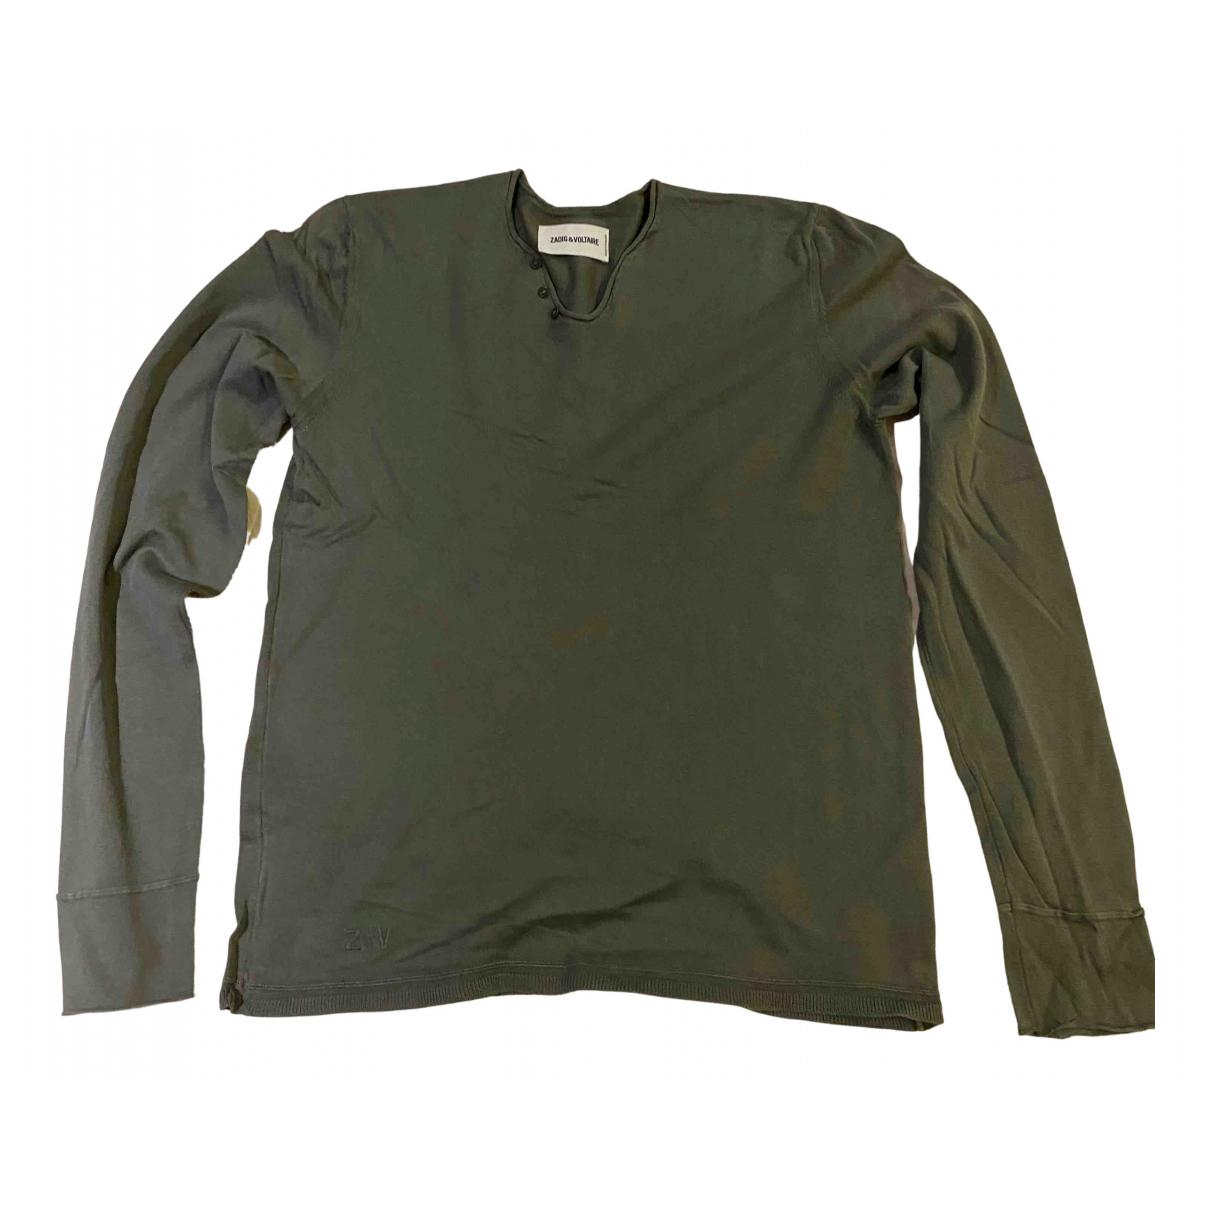 Zadig & Voltaire \N Khaki Cotton Knitwear & Sweatshirts for Men XS International